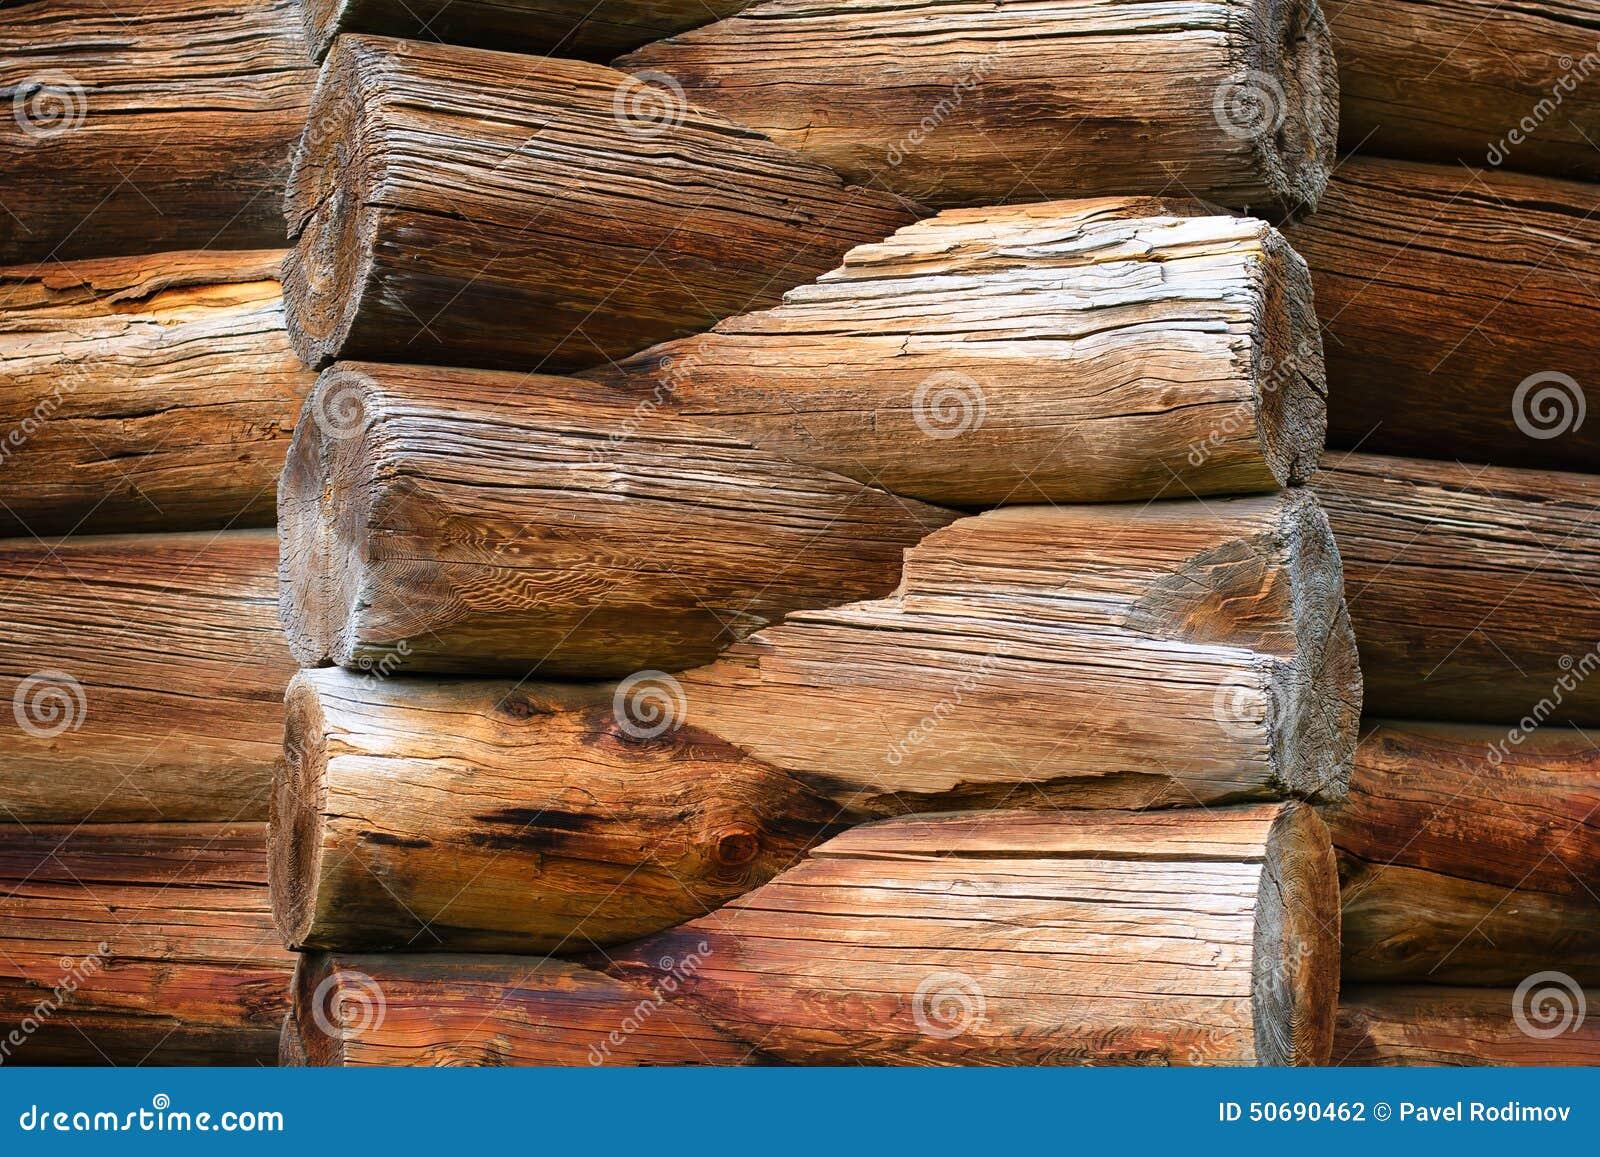 Download 一部分的木屋 库存照片. 图片 包括有 部分, 裂缝, 自然, 拱道, 乡下, 室外, 布琼布拉, 外部 - 50690462